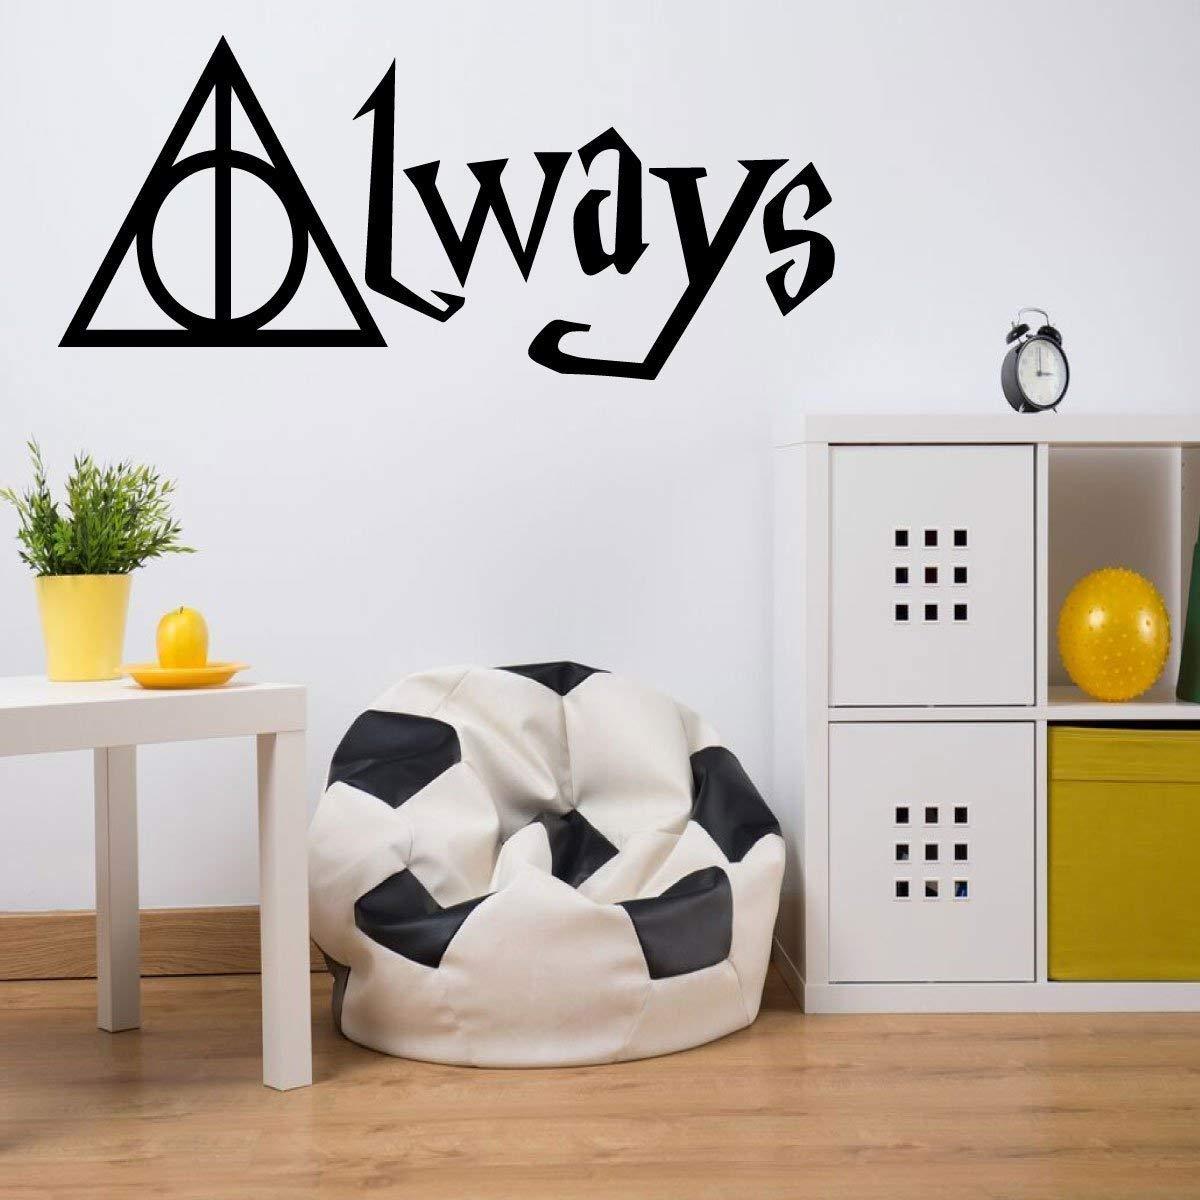 Professor Severus Snape Wall Art - Always - Vinyl Sticker Decal for Home Decor Bedroom, Playroom or Classroom Decoration